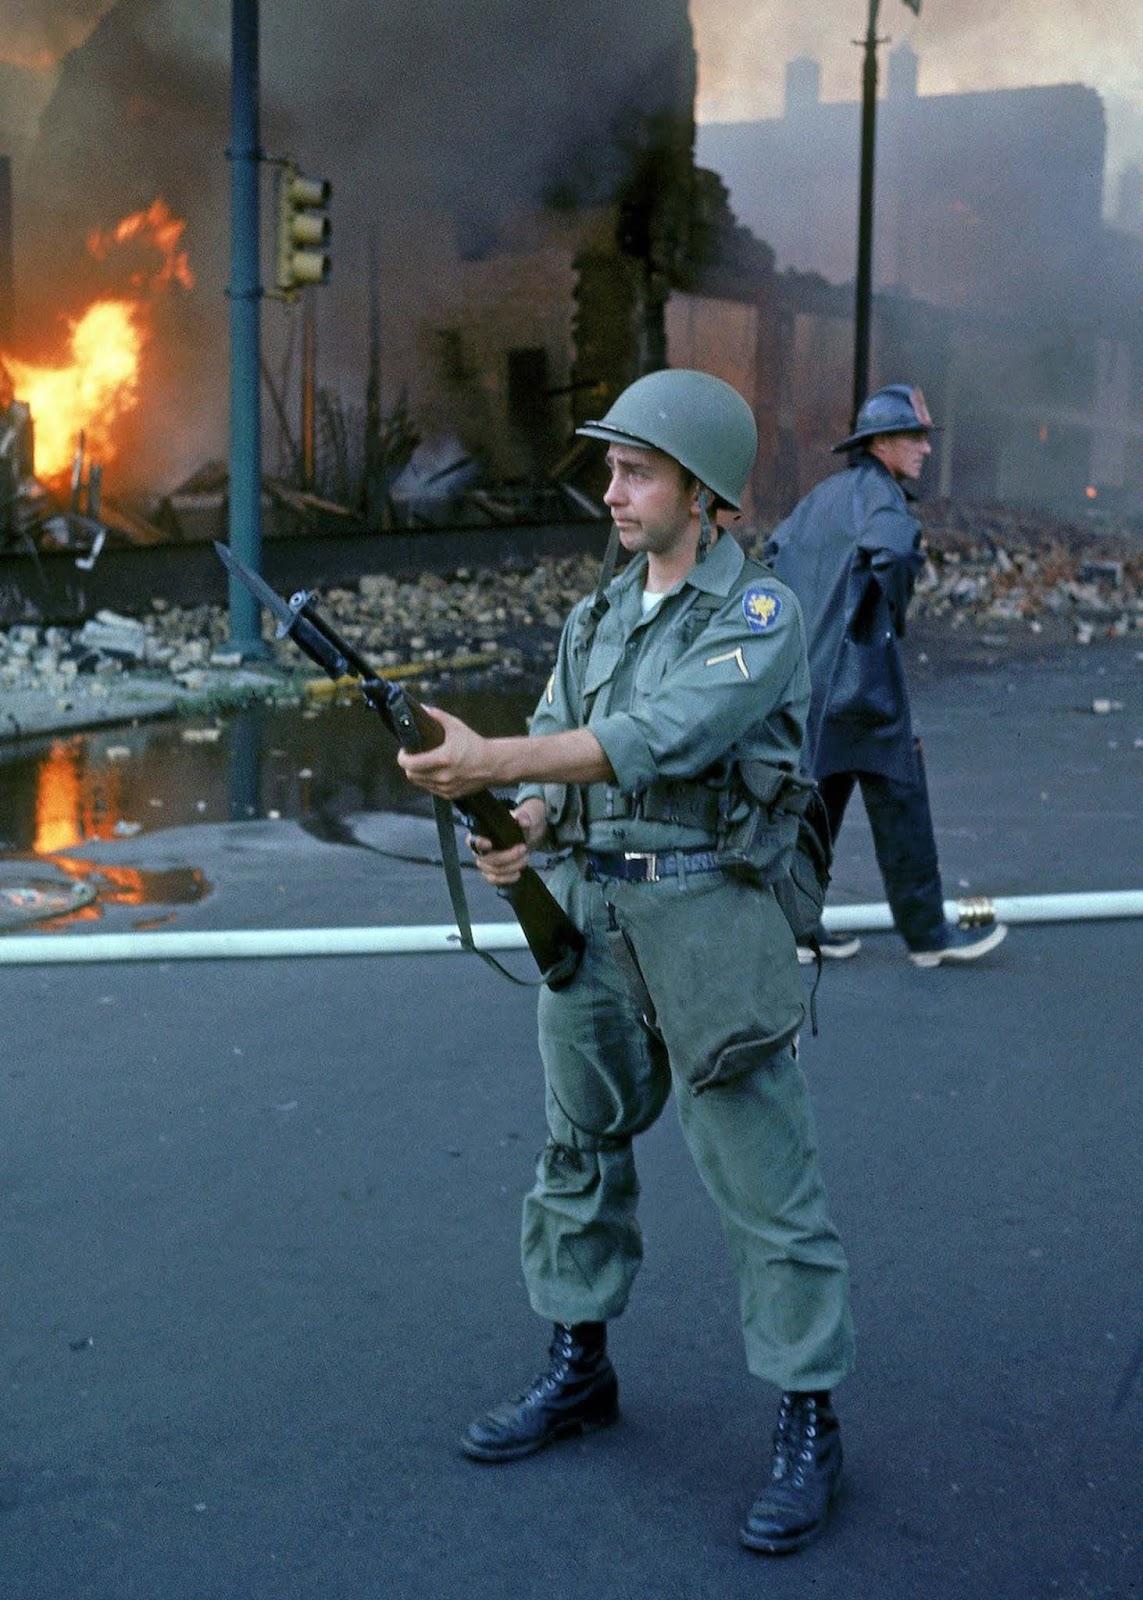 National Guardsman patroling a Detroit street.